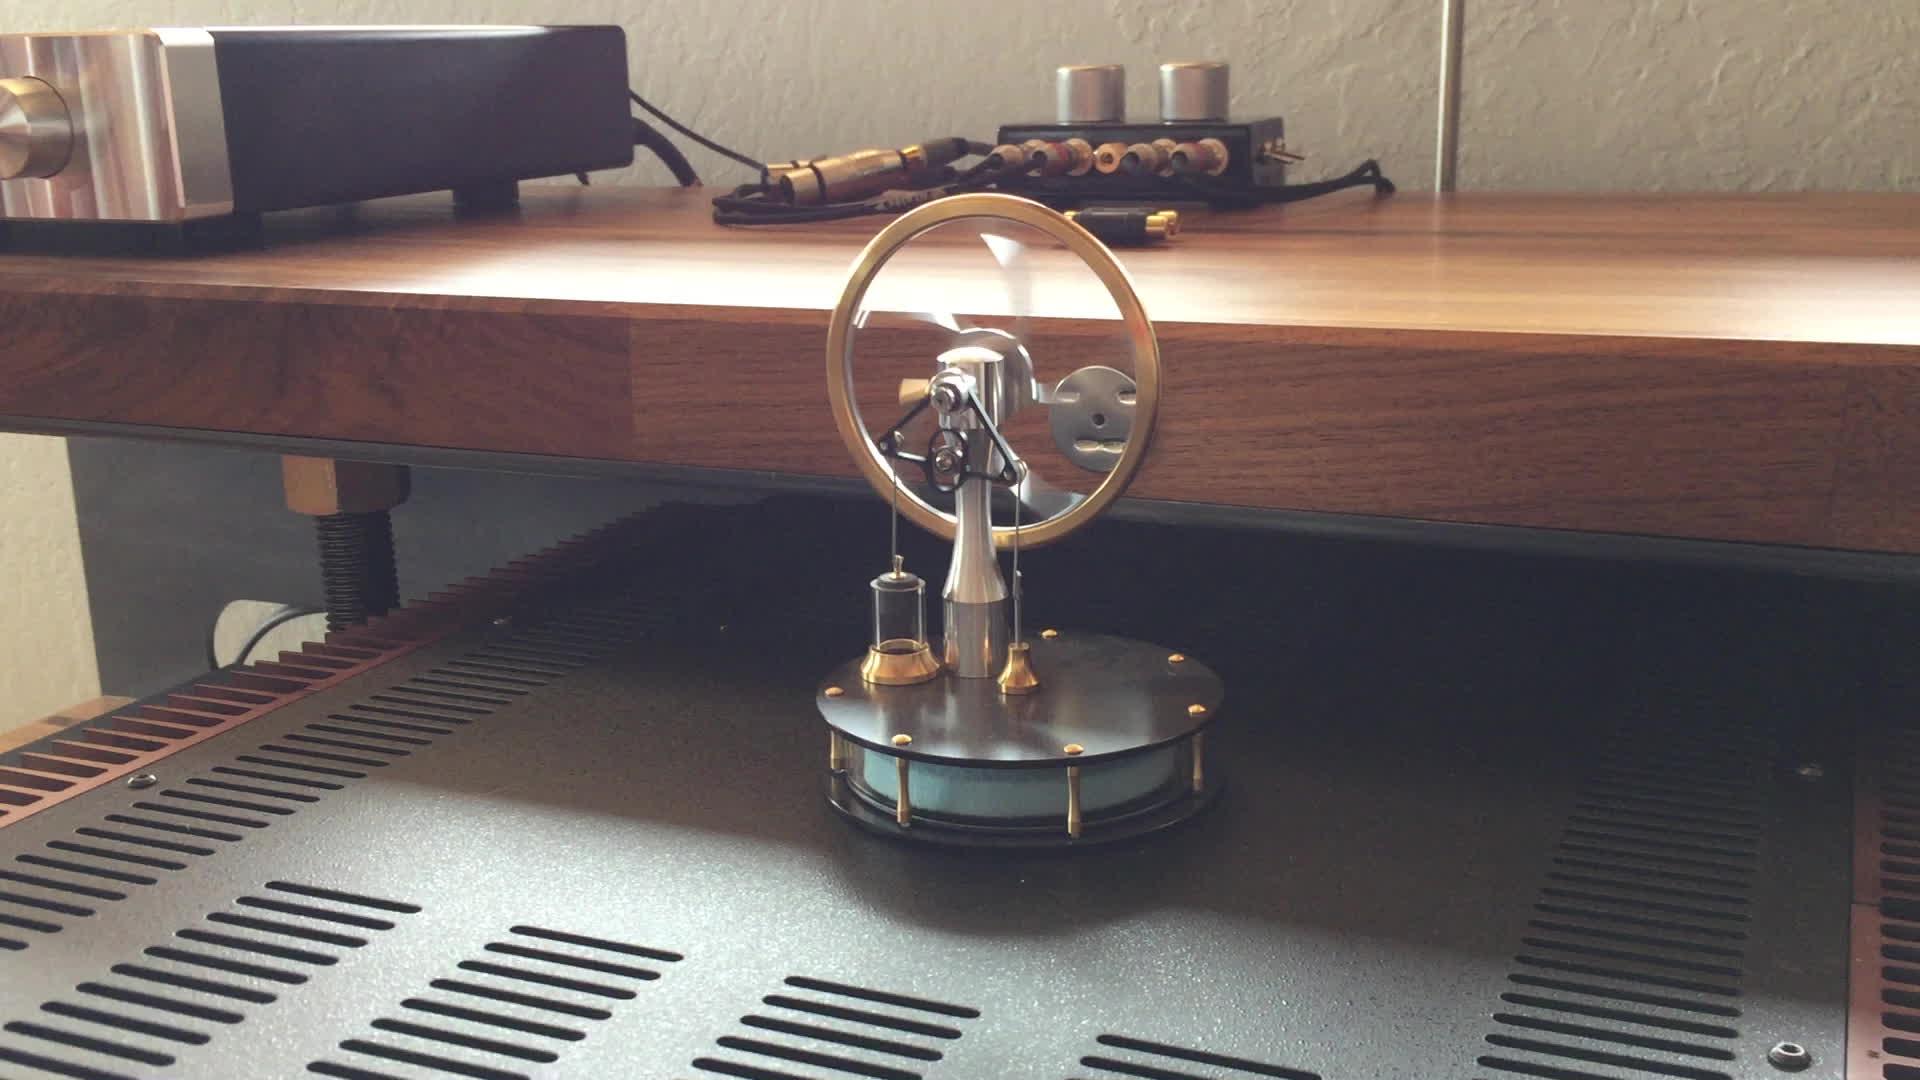 audiophile, Sterling engine on BAT GIFs